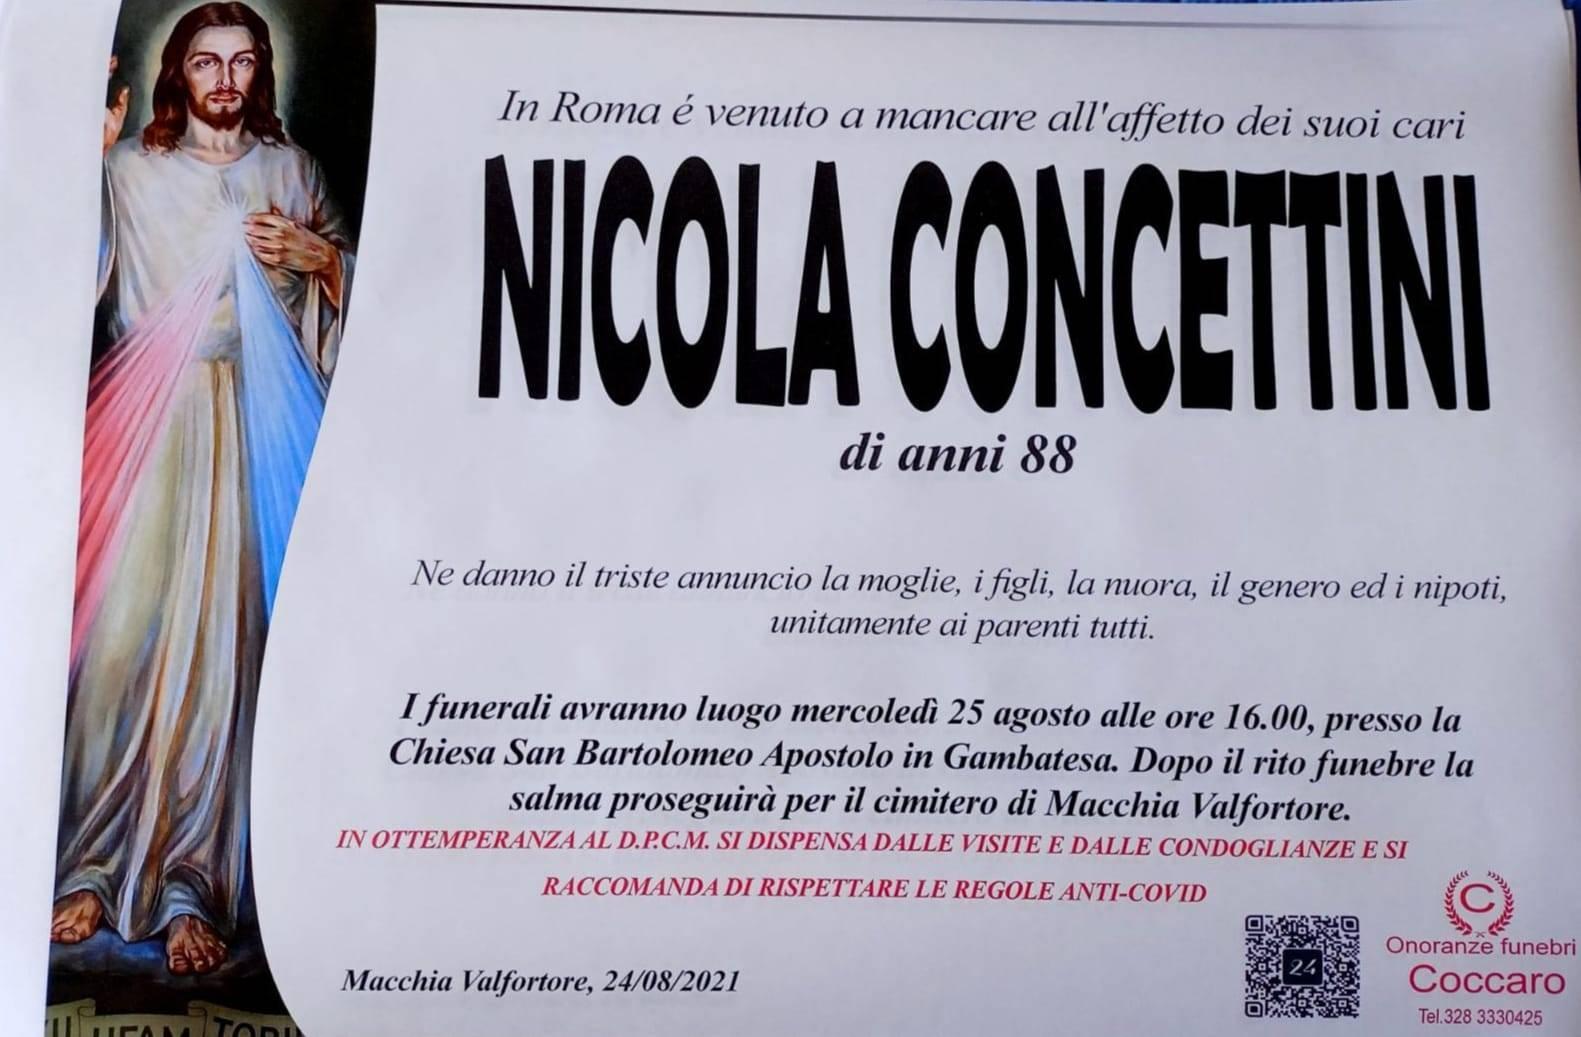 Nicola Concettini